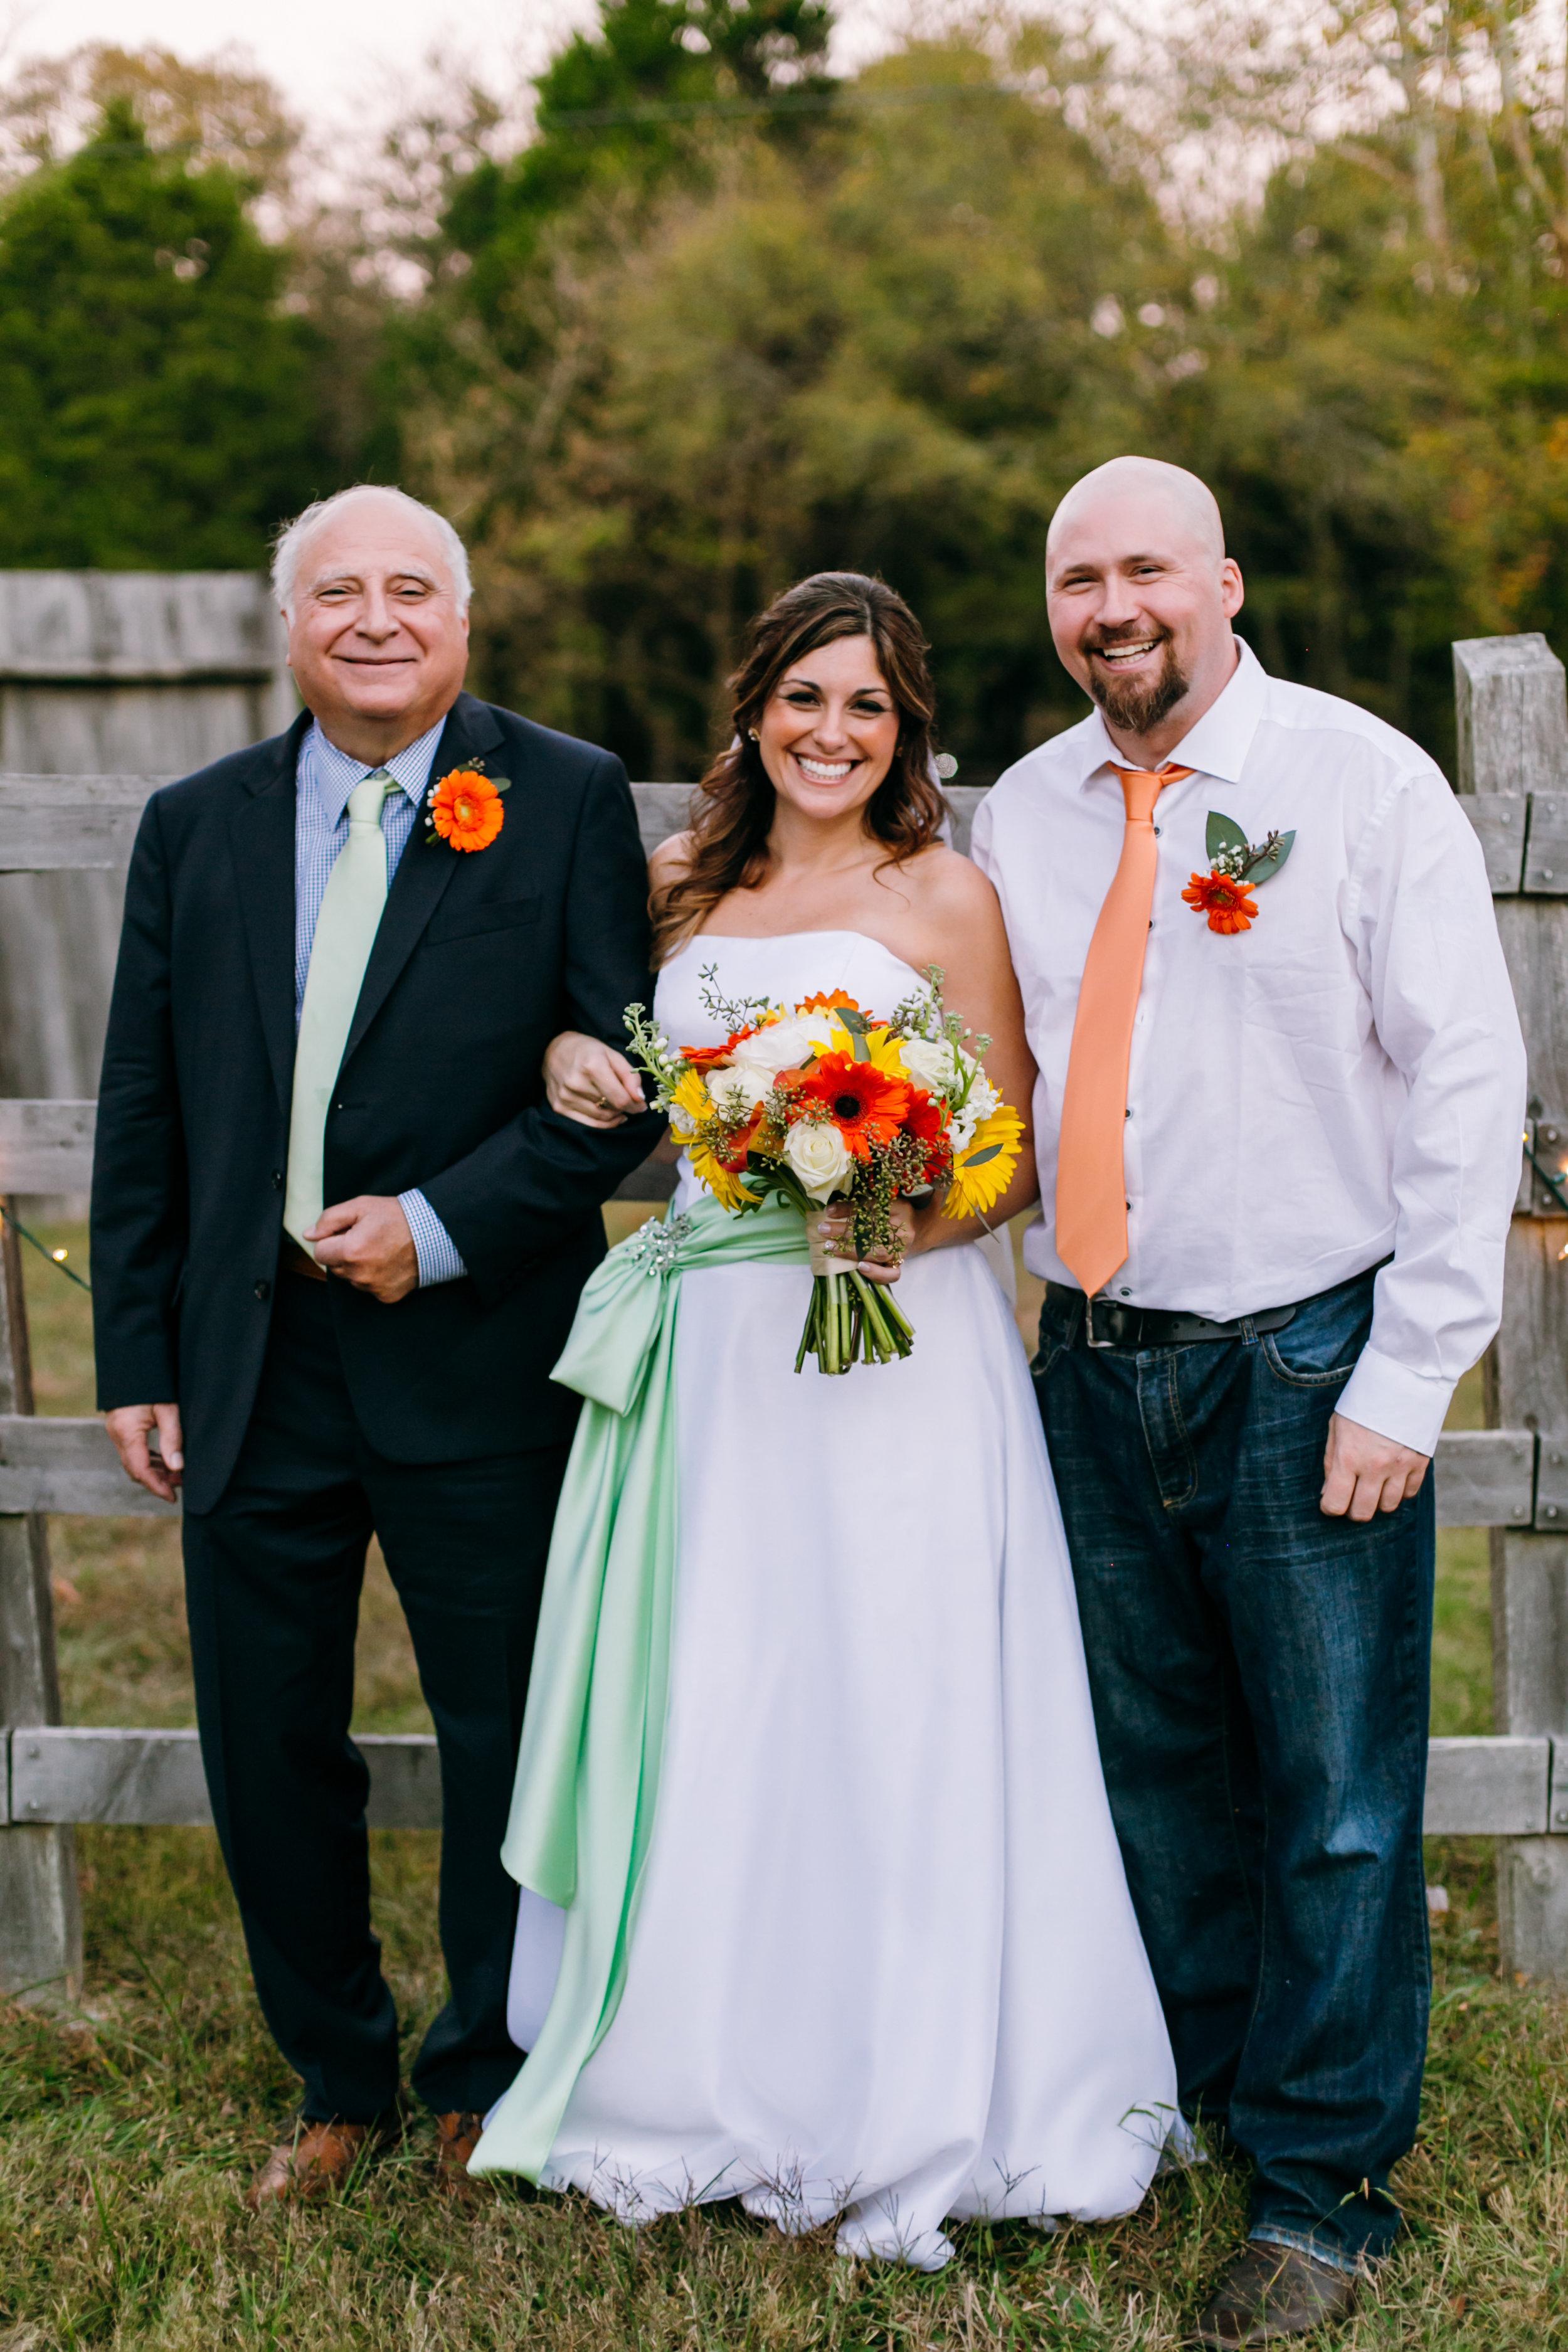 KaraNixonWeddings-Nashville-TN-Wedding-91.jpg